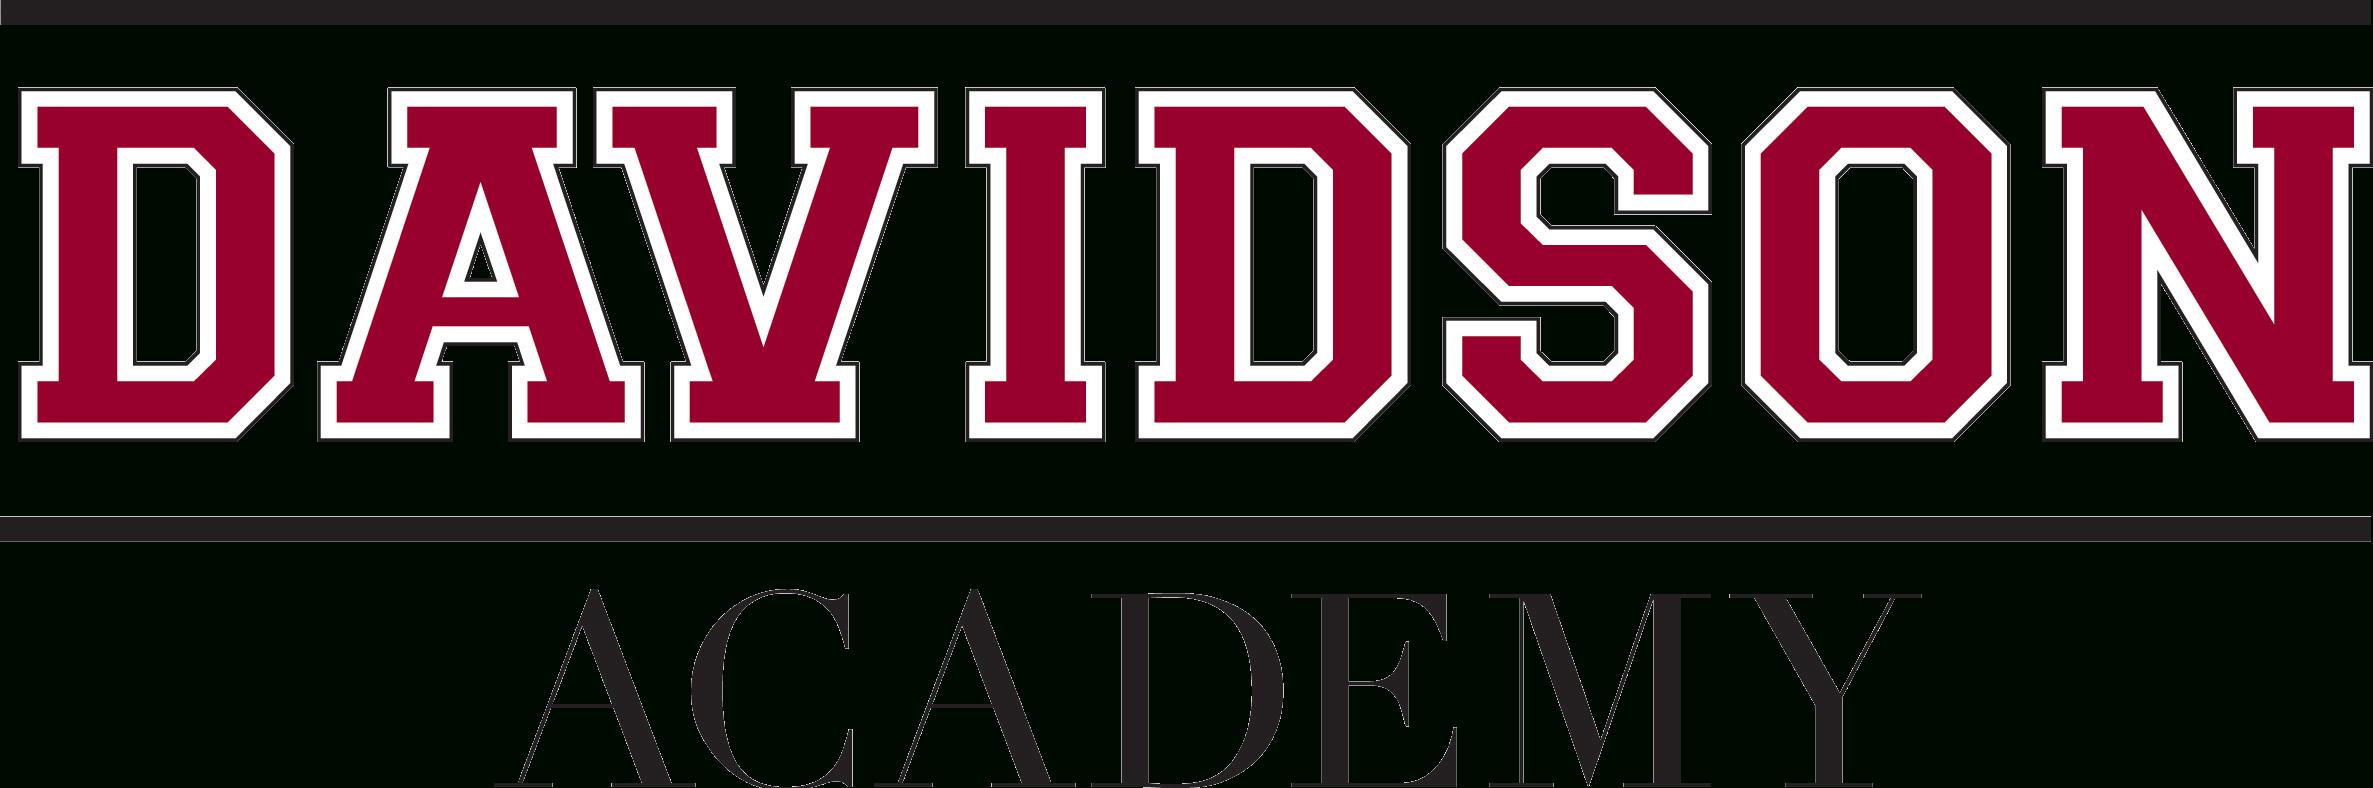 Davidson Academy | College Preparatory School | Nashville, Tn Inside Nashville Davidson County School Calendar